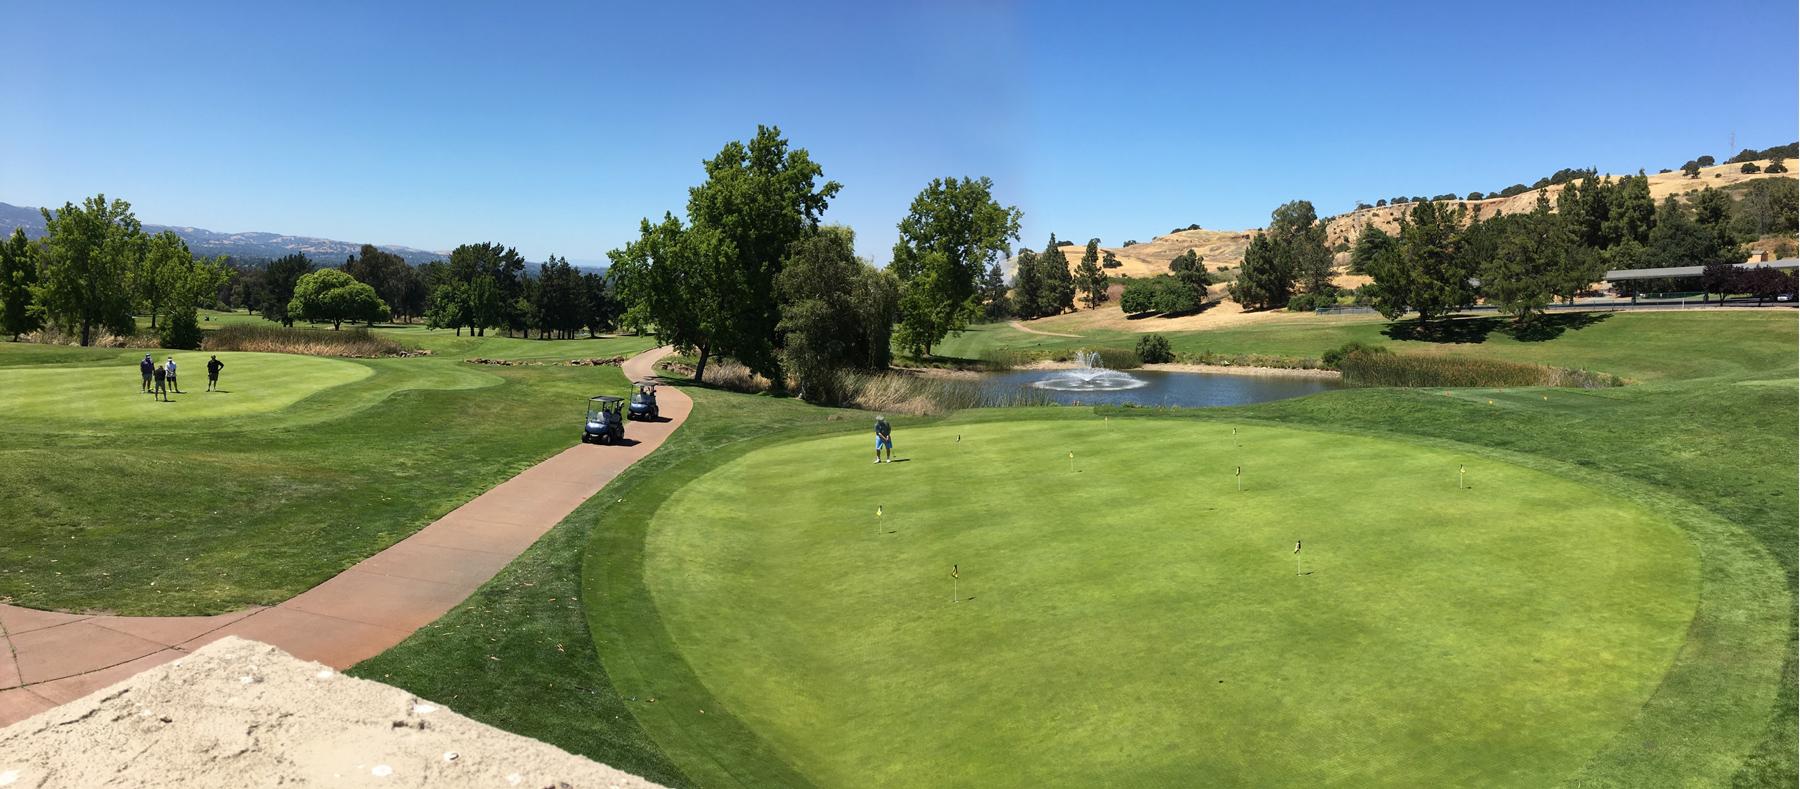 Golf-Course-PANO.jpg